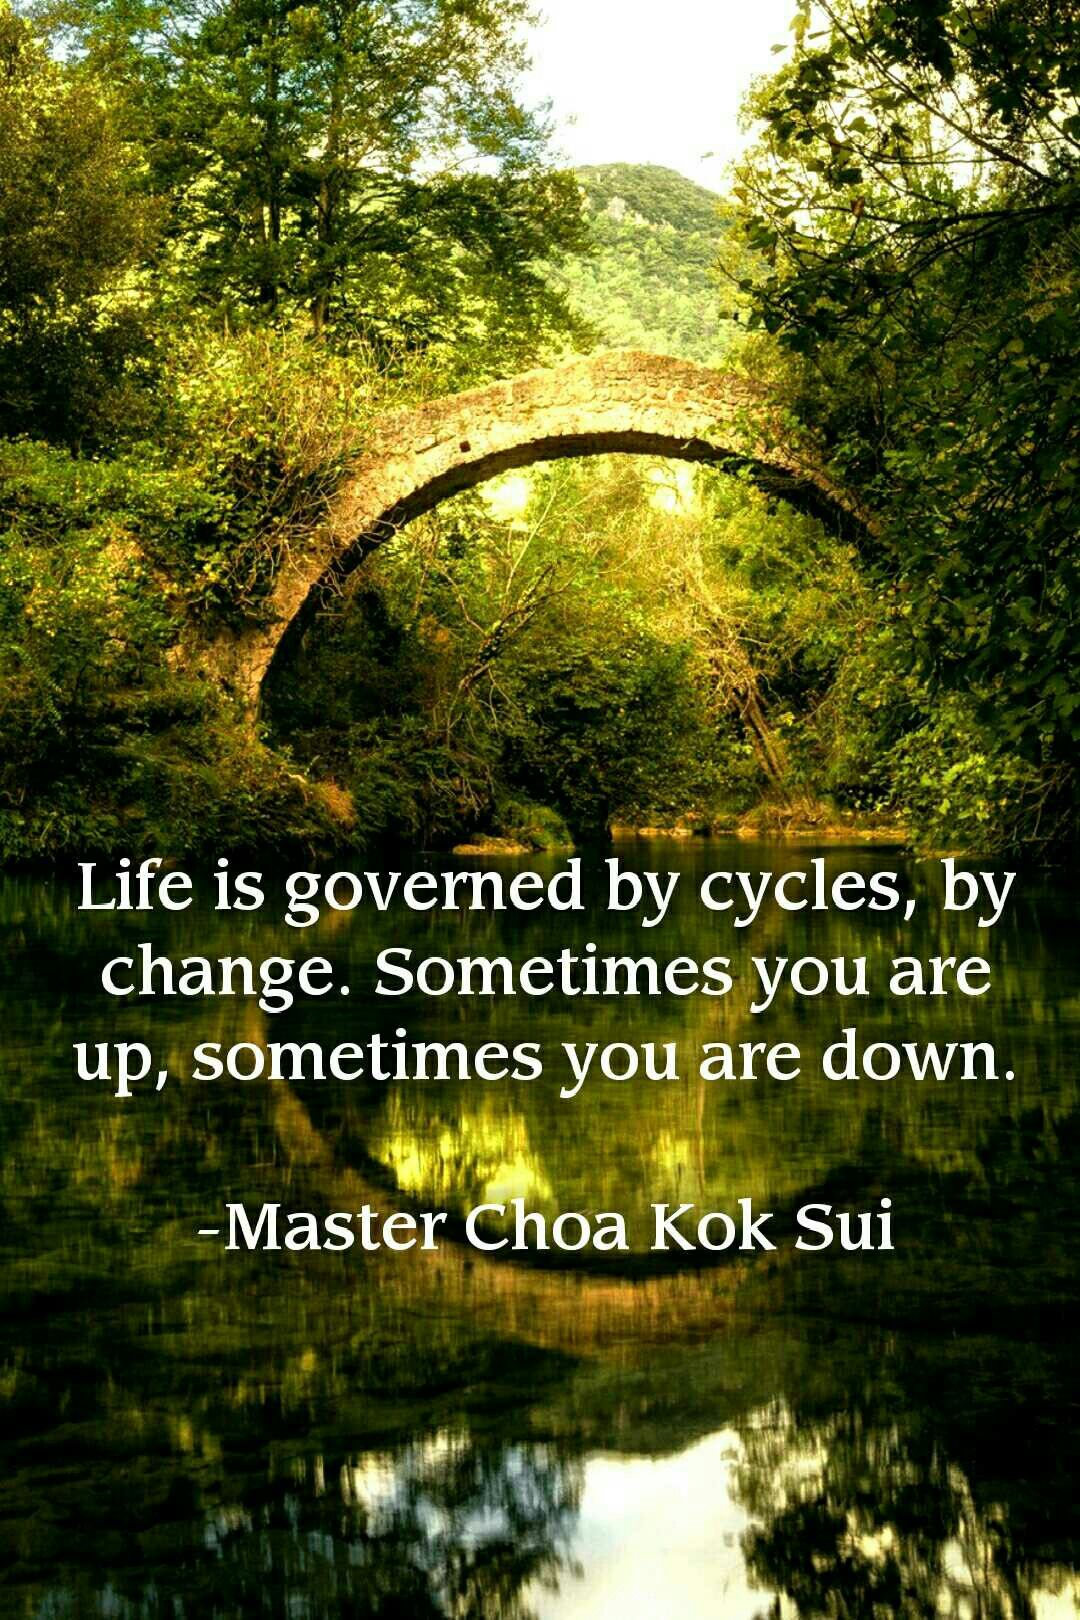 Wisdom Quotes #quotes #UnfoldApp #MCKS #life #cycles